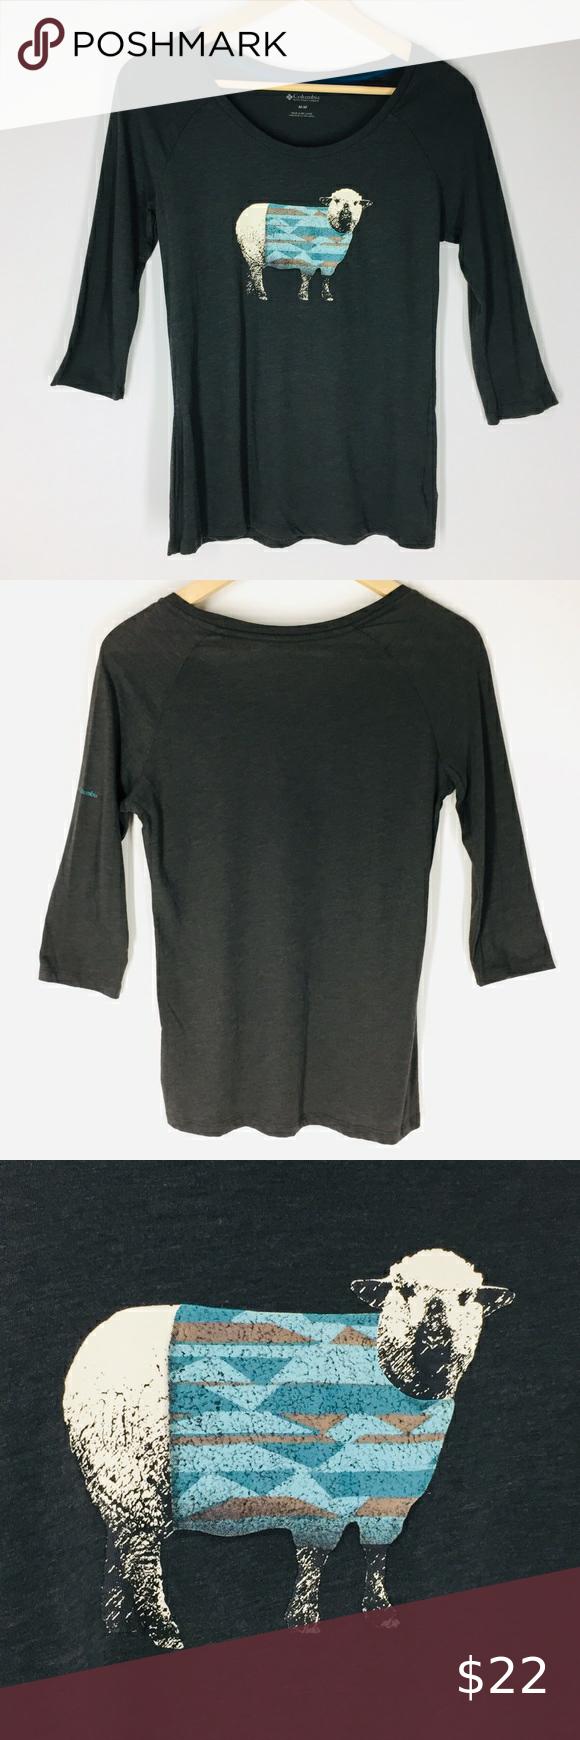 NWOT Columbia Sheep in Sweater Shirt